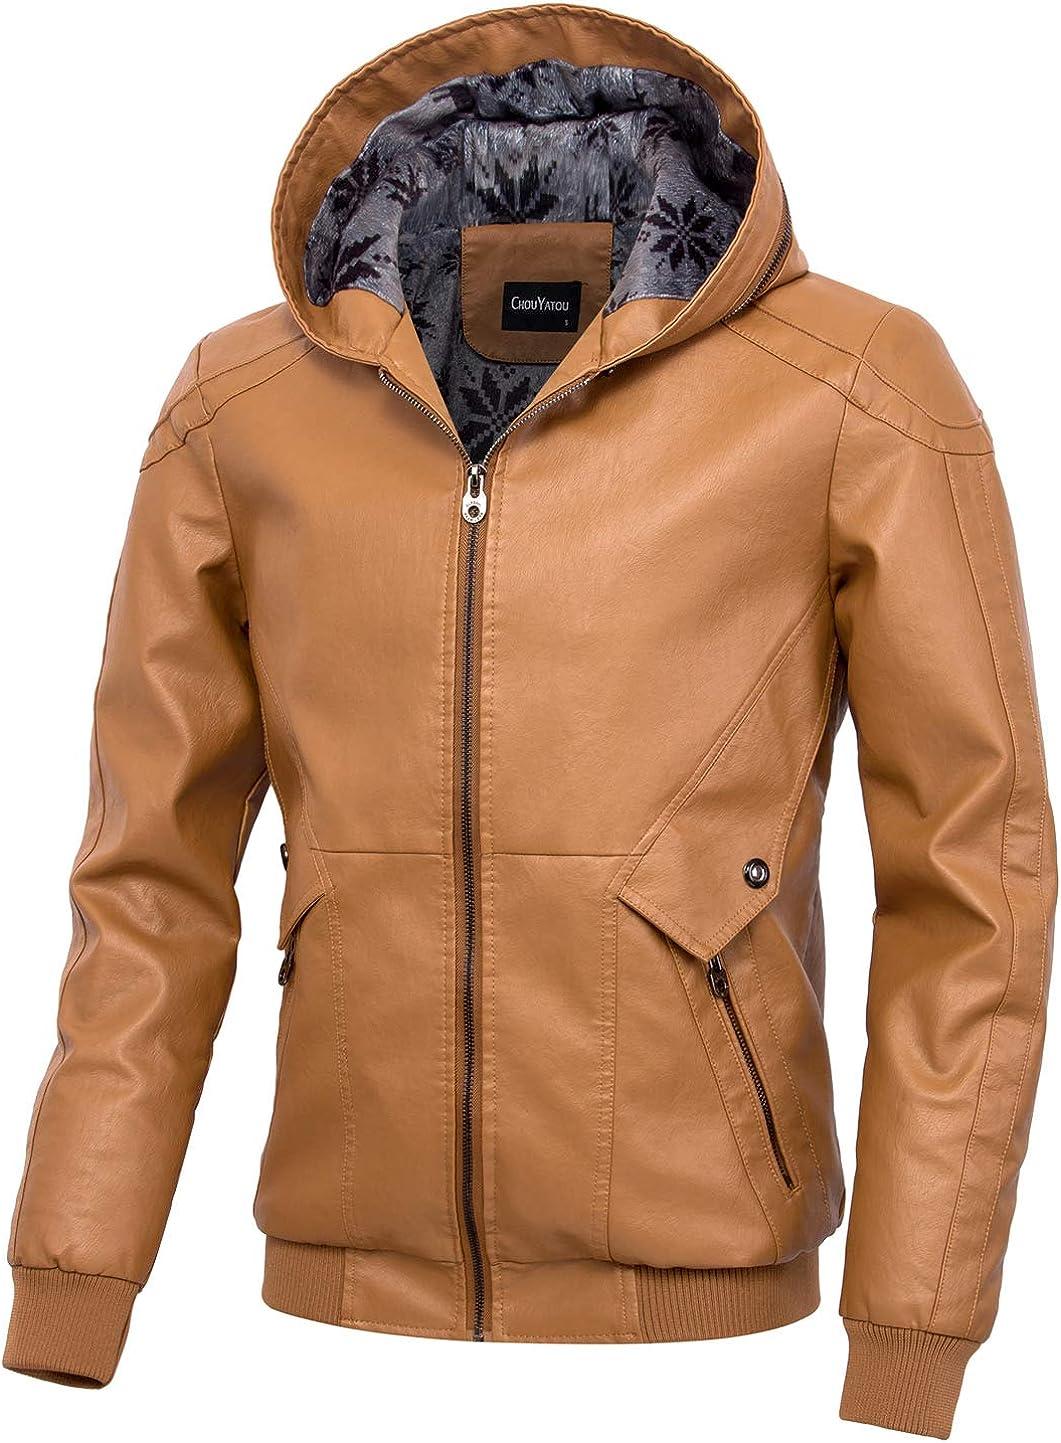 chouyatou Men's Winter Stylish Hooded Full Zip Fleece Lined Motorcycle Pu Leather Biker Jacket